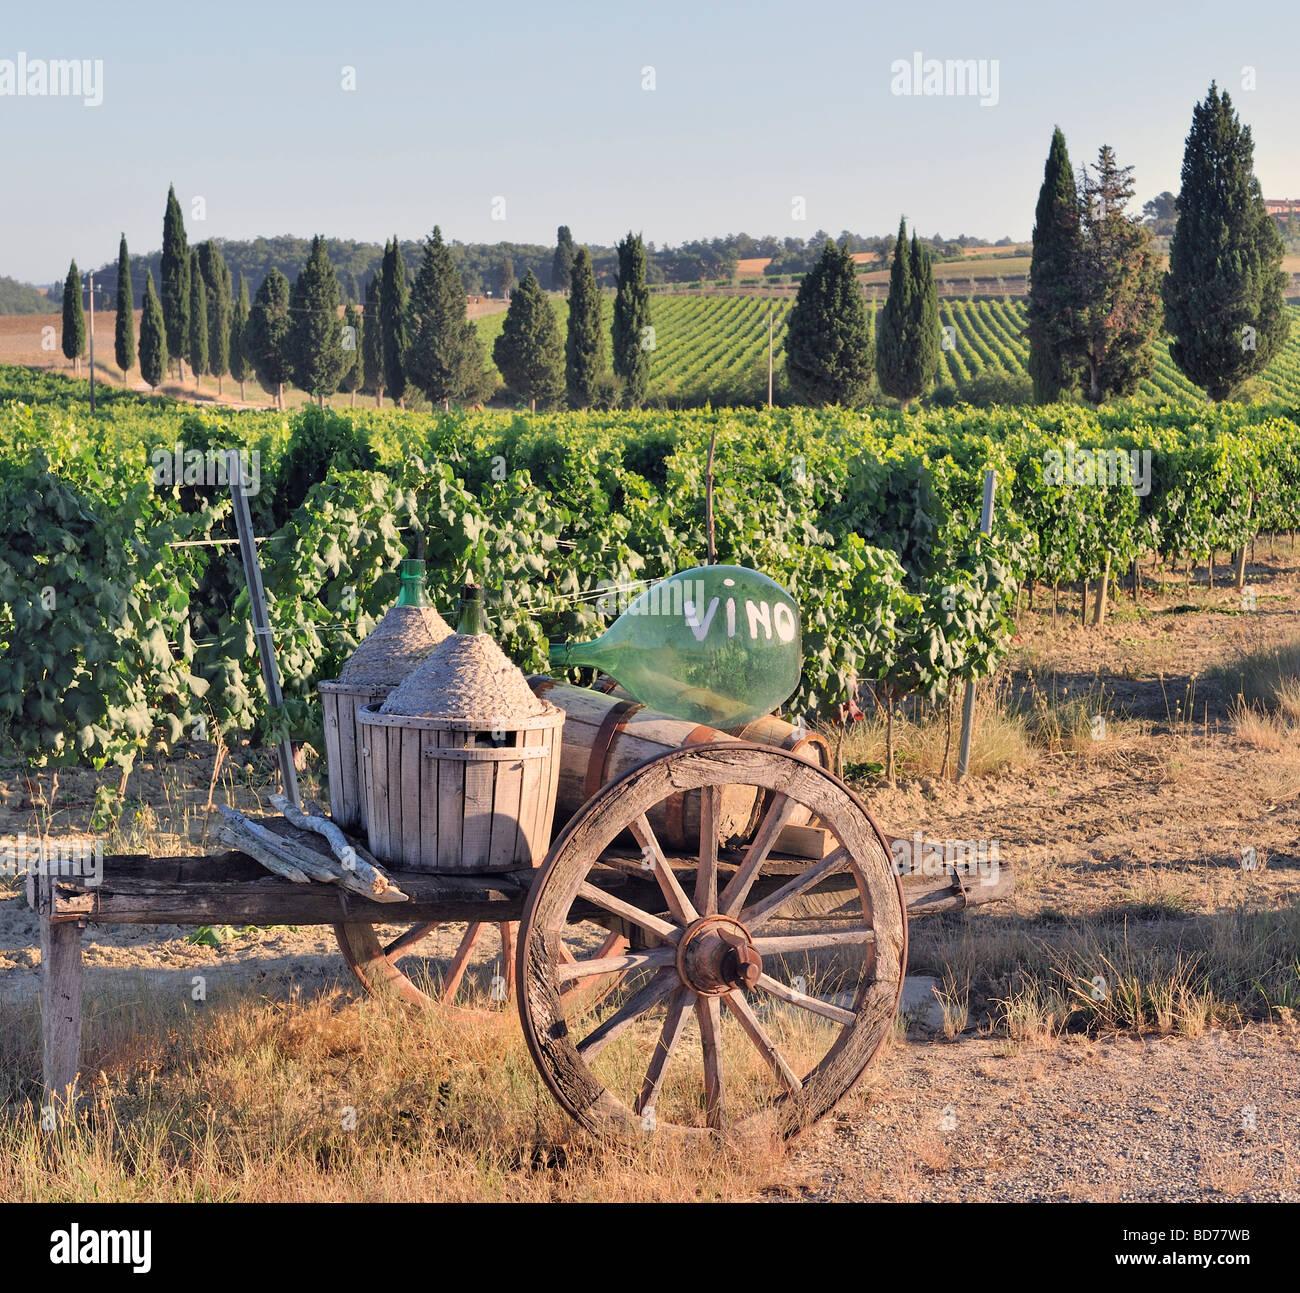 Wine Flasks Stock Photos & Wine Flasks Stock Images - Alamy